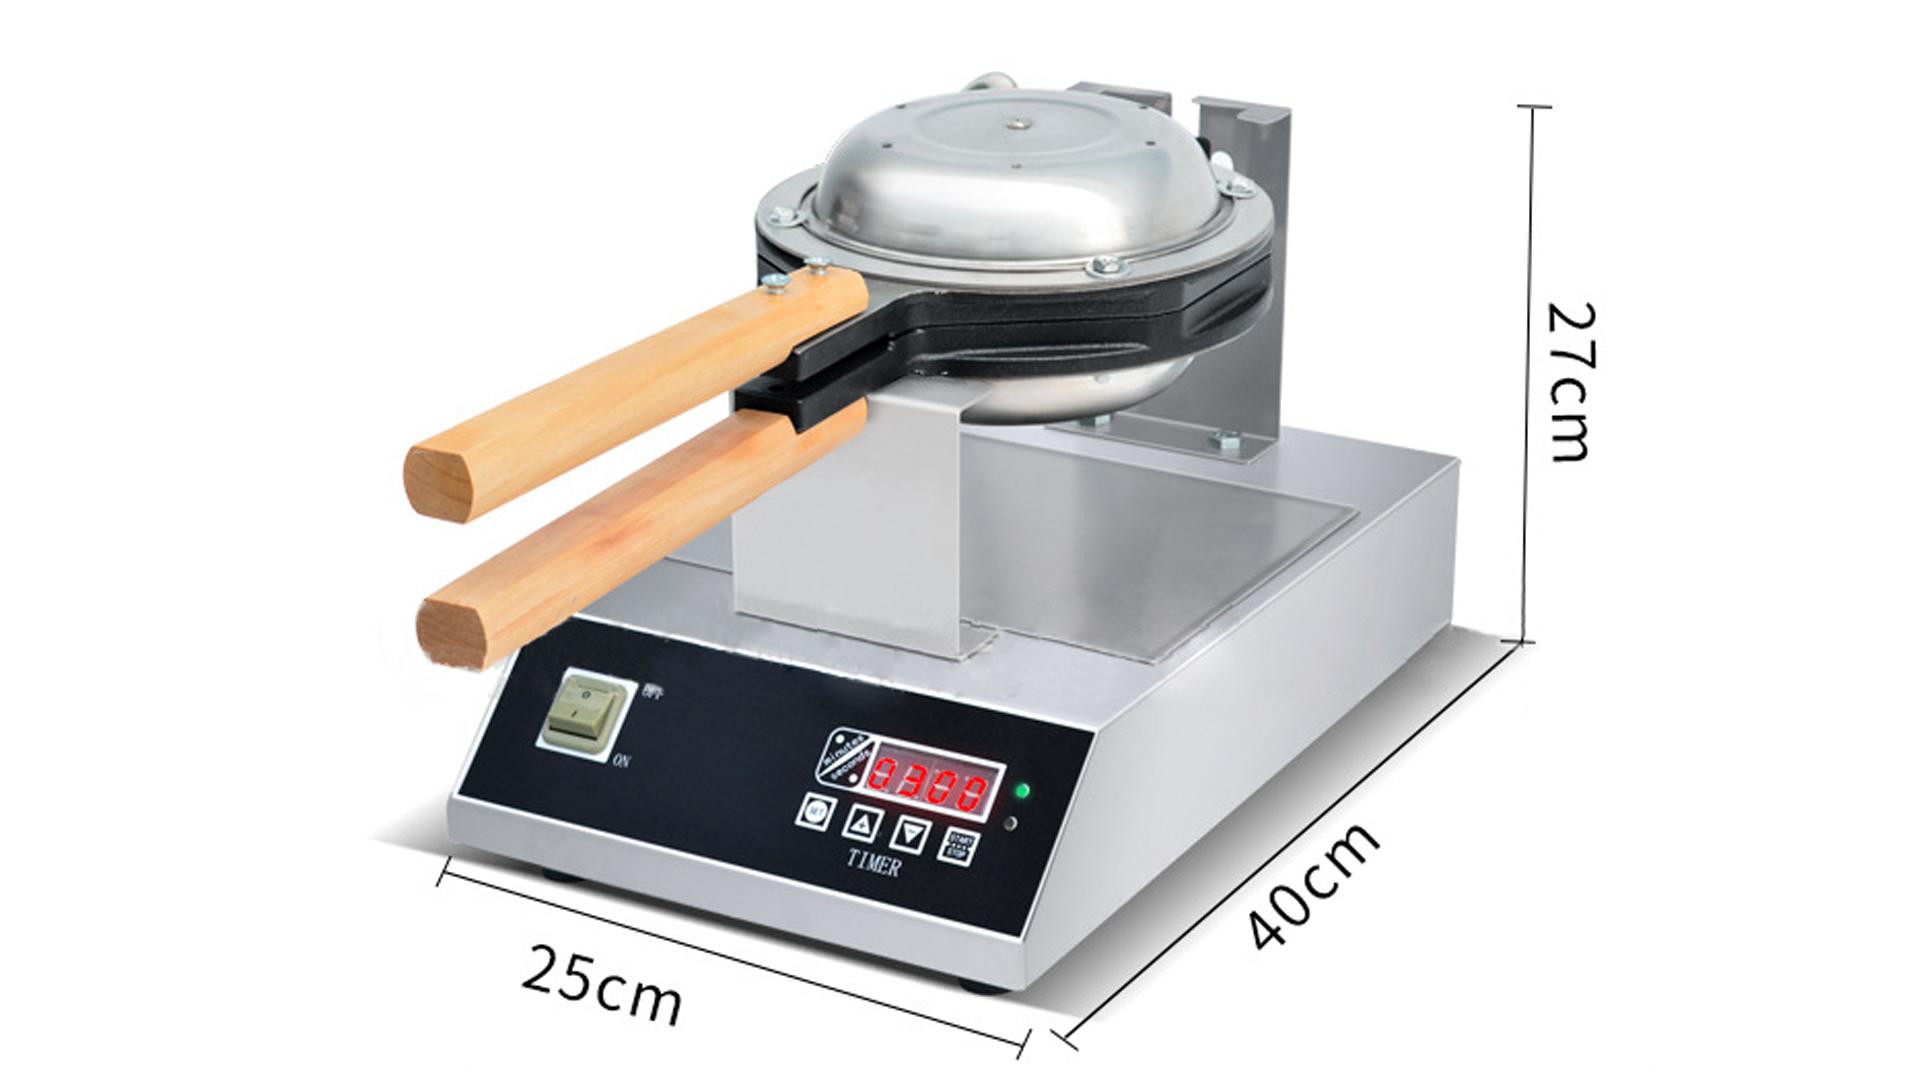 Benchu commercial household electric egg pan mold for egg yolk machine set snacks